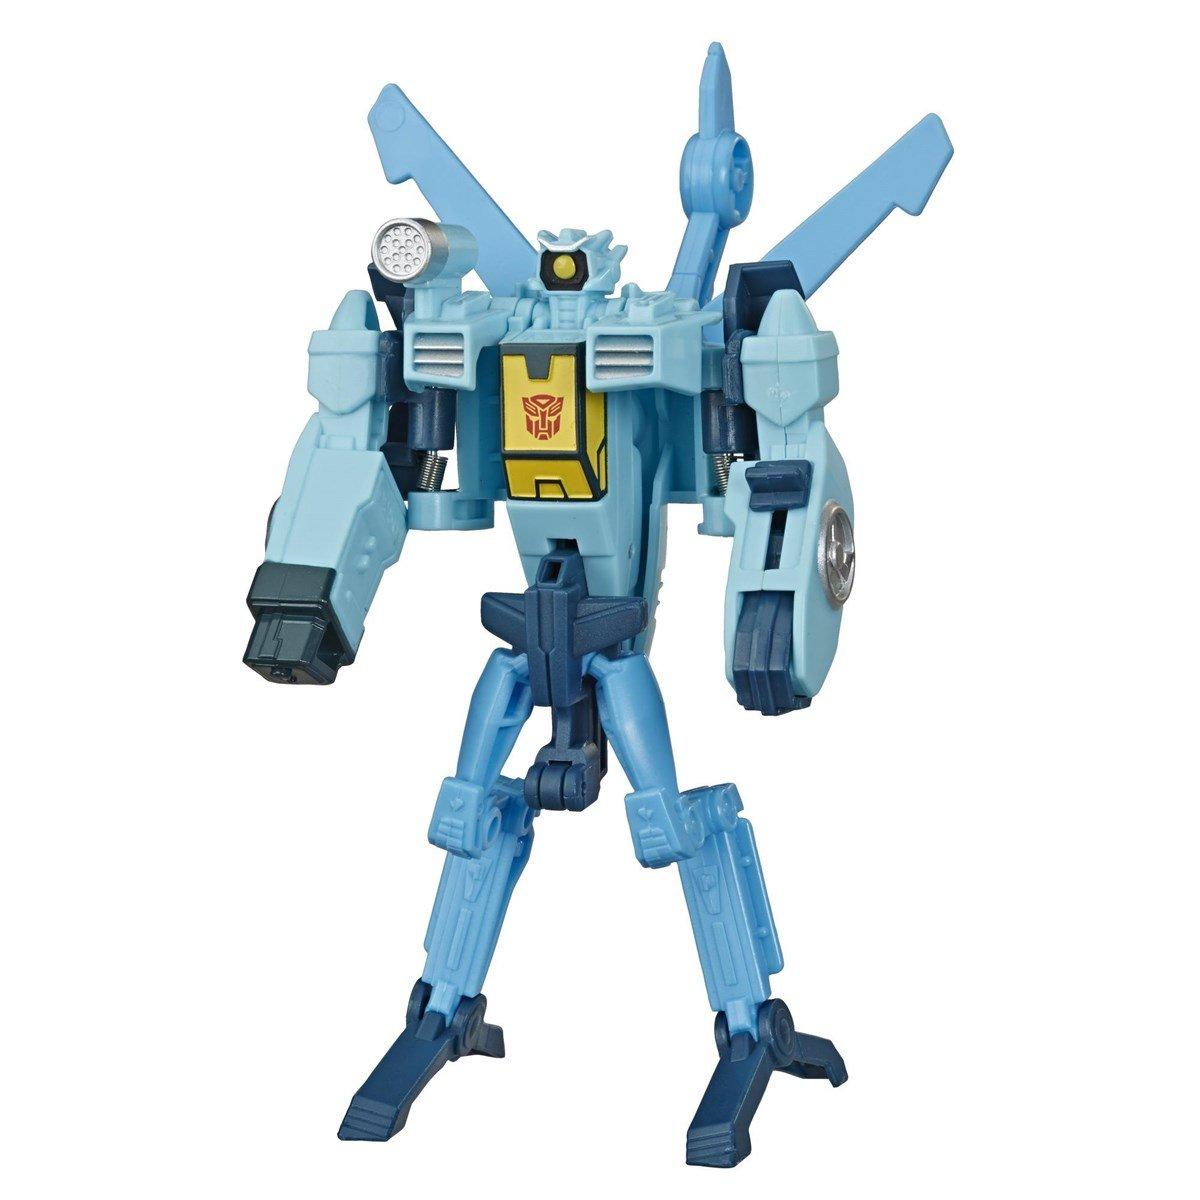 Figurina Transformers Cyberverse, Whirl E7072